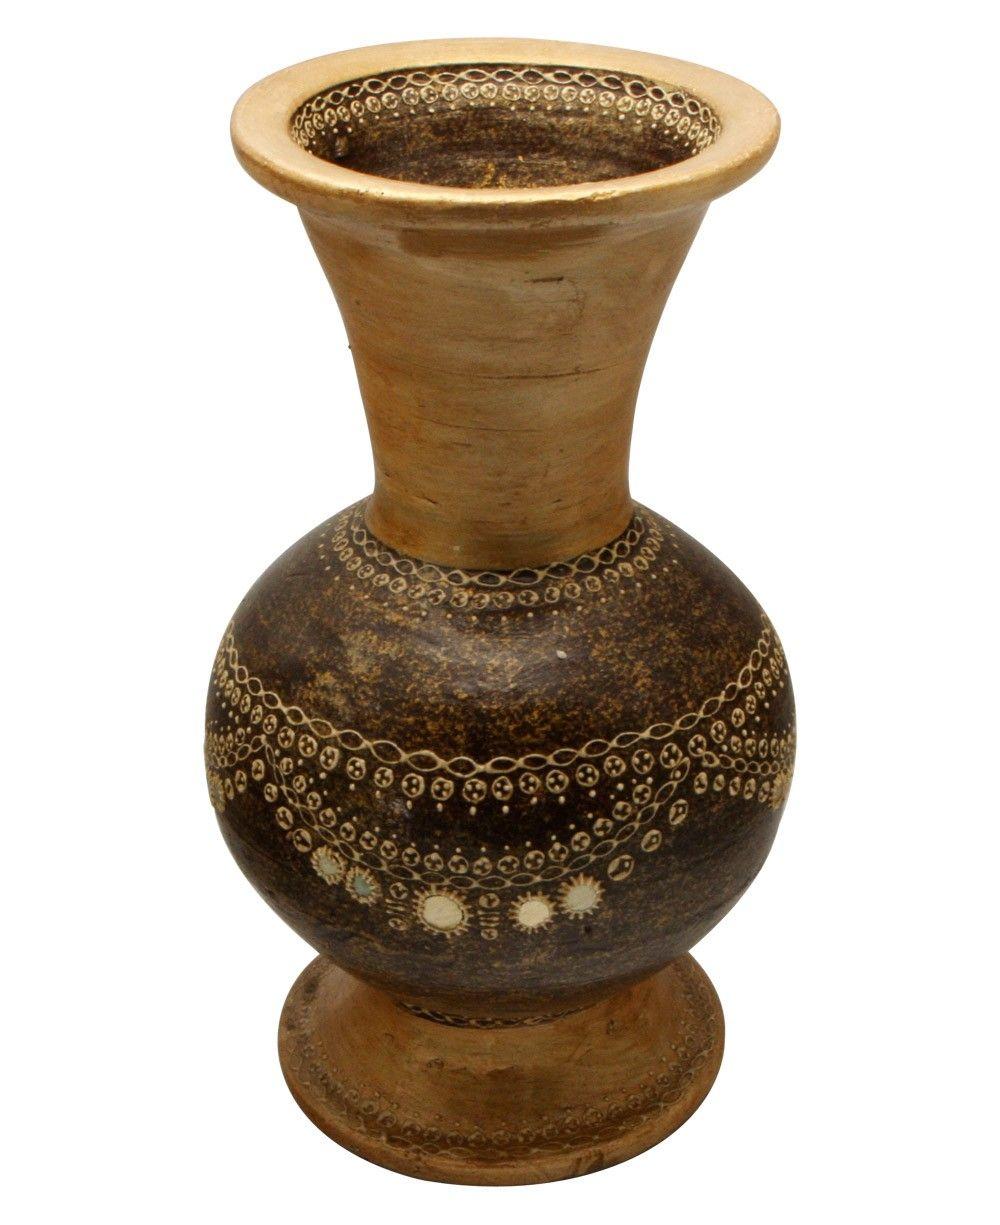 Decorative ceramic pots indian home decor decorative ceramic decorative ceramic pots indian home decor decorative ceramic pot hand painted pottery reviewsmspy